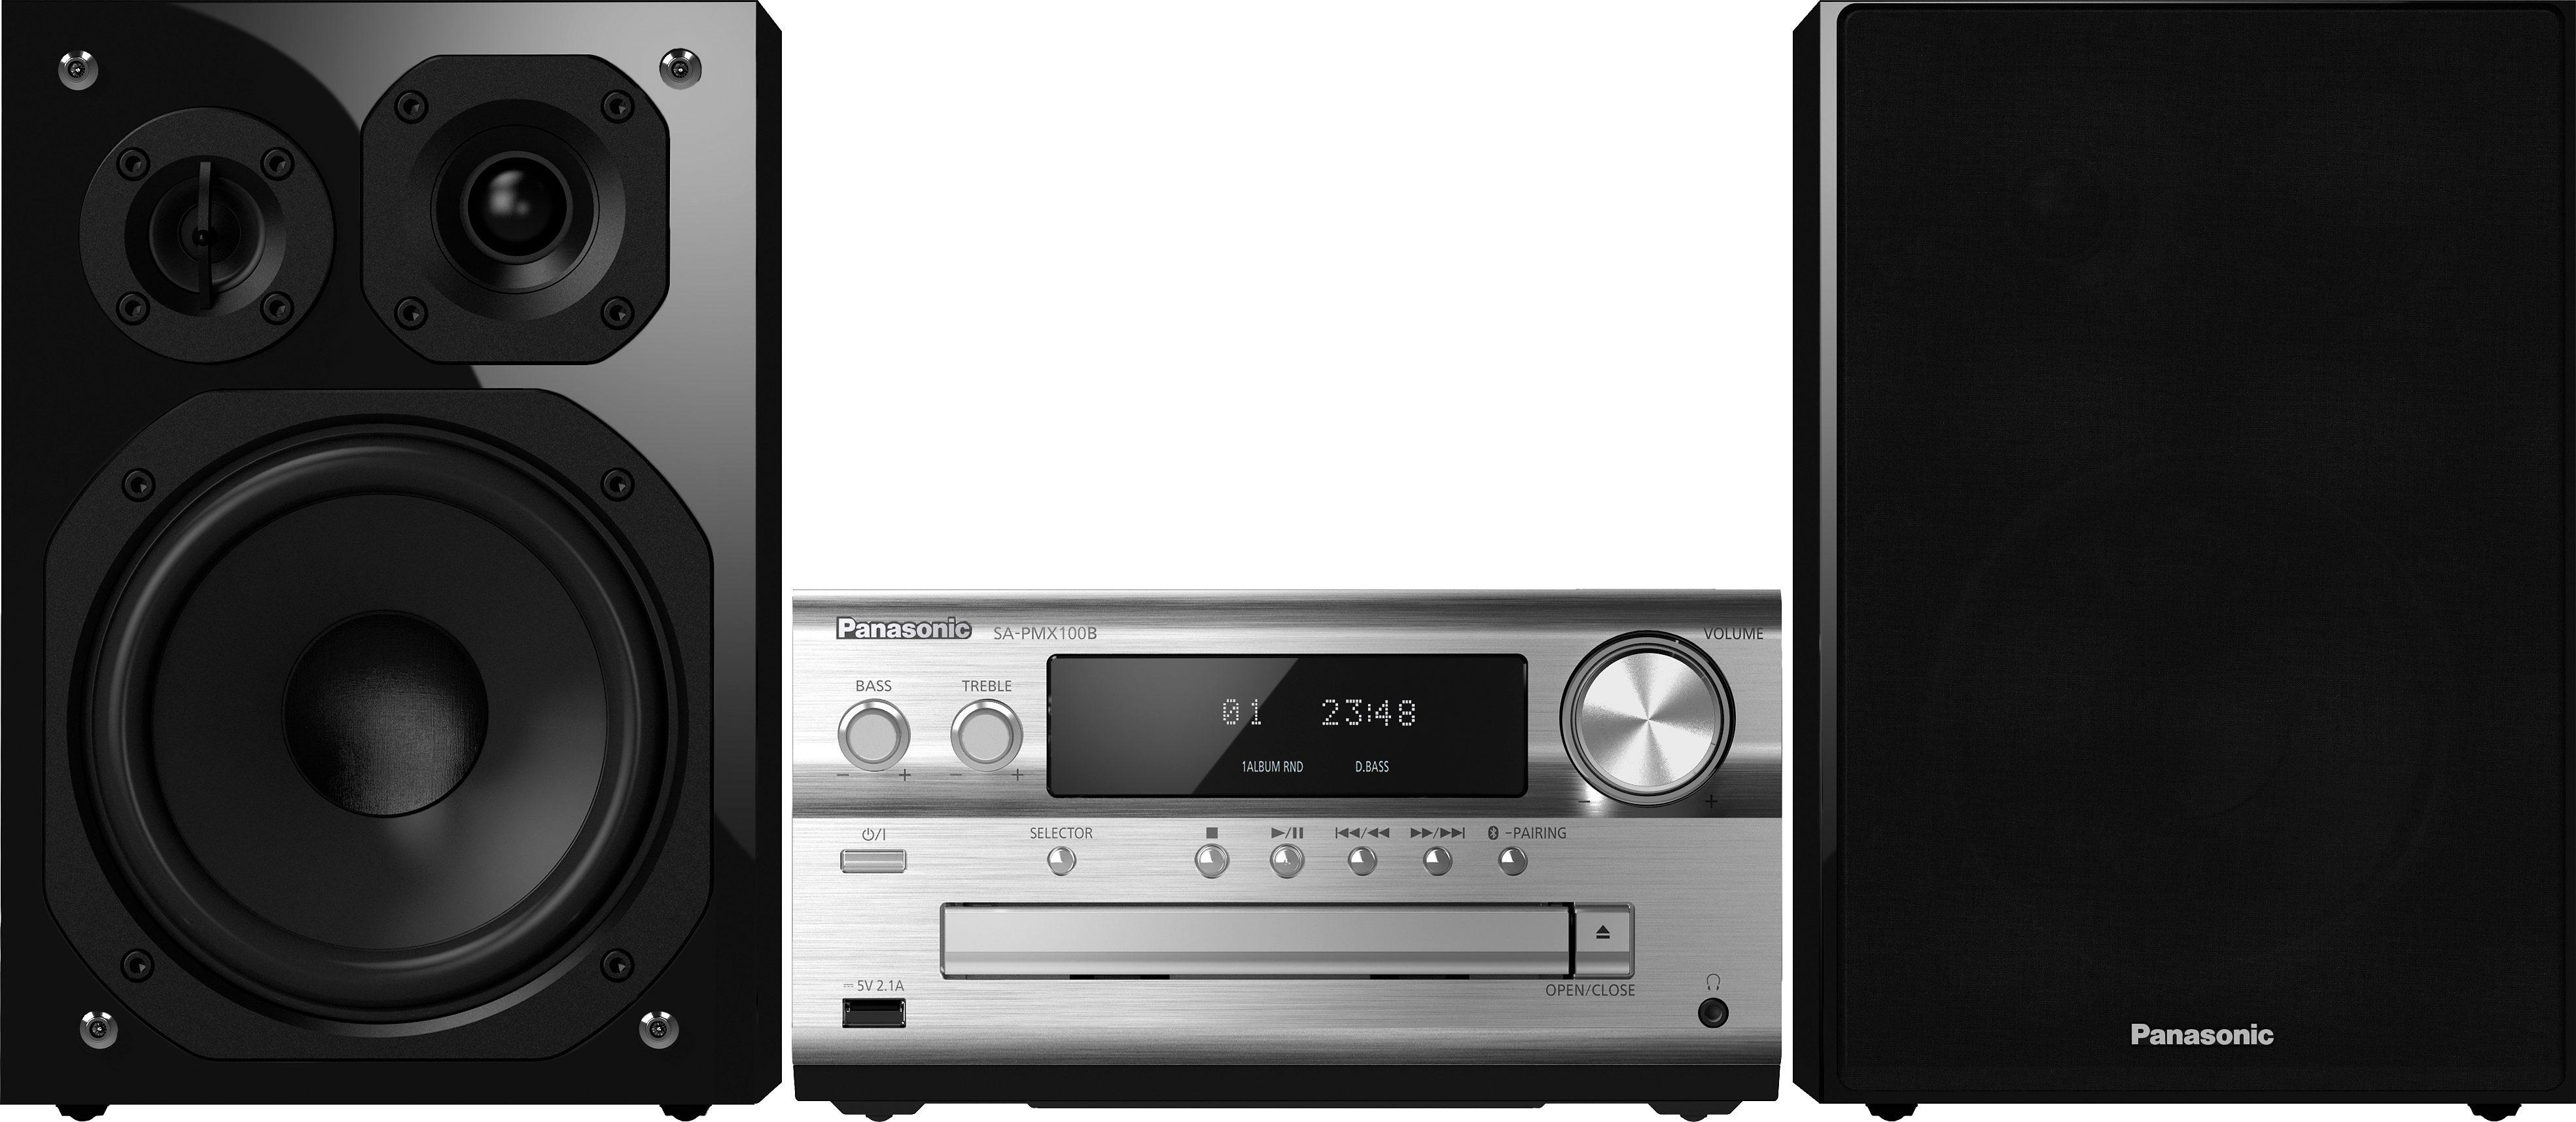 Panasonic SC-PMX100BEG Kompaktanlage, Spotify/Napster/Panasonic Music Streaming App, Airplay